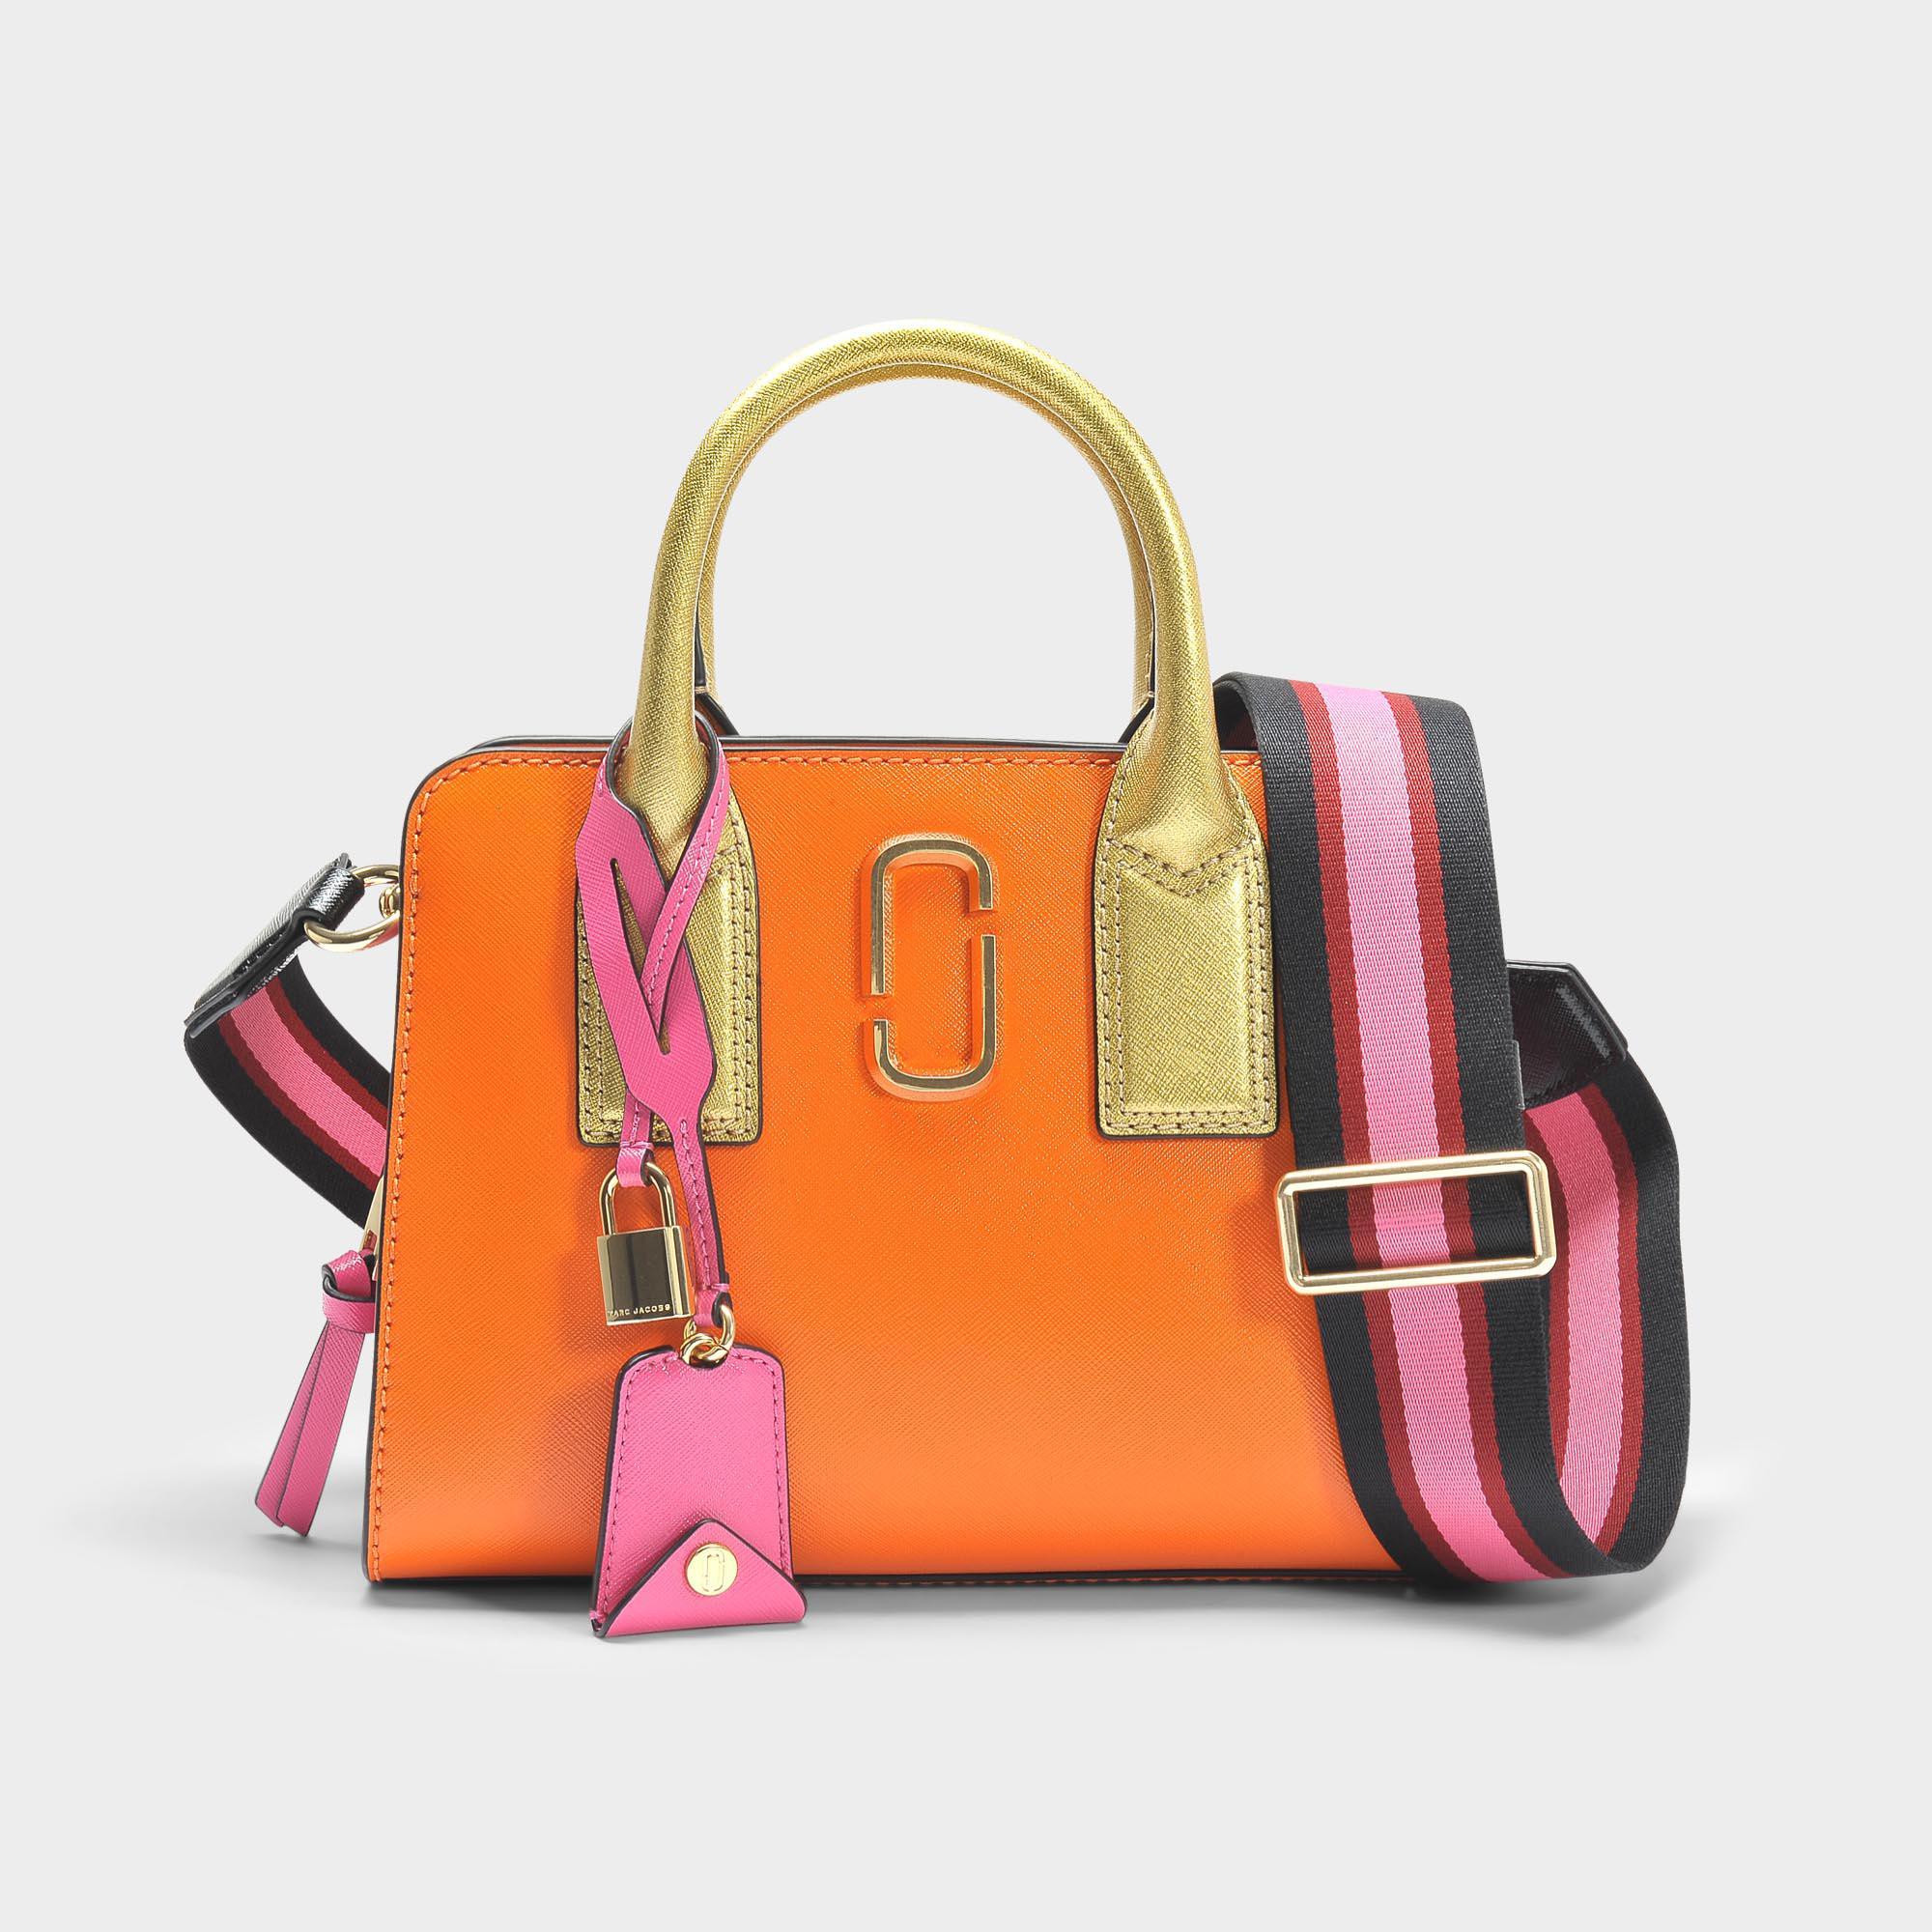 Marc Jacobs Sac Little Big Shot en Cuir Craquelé Orange 4iAGBQY